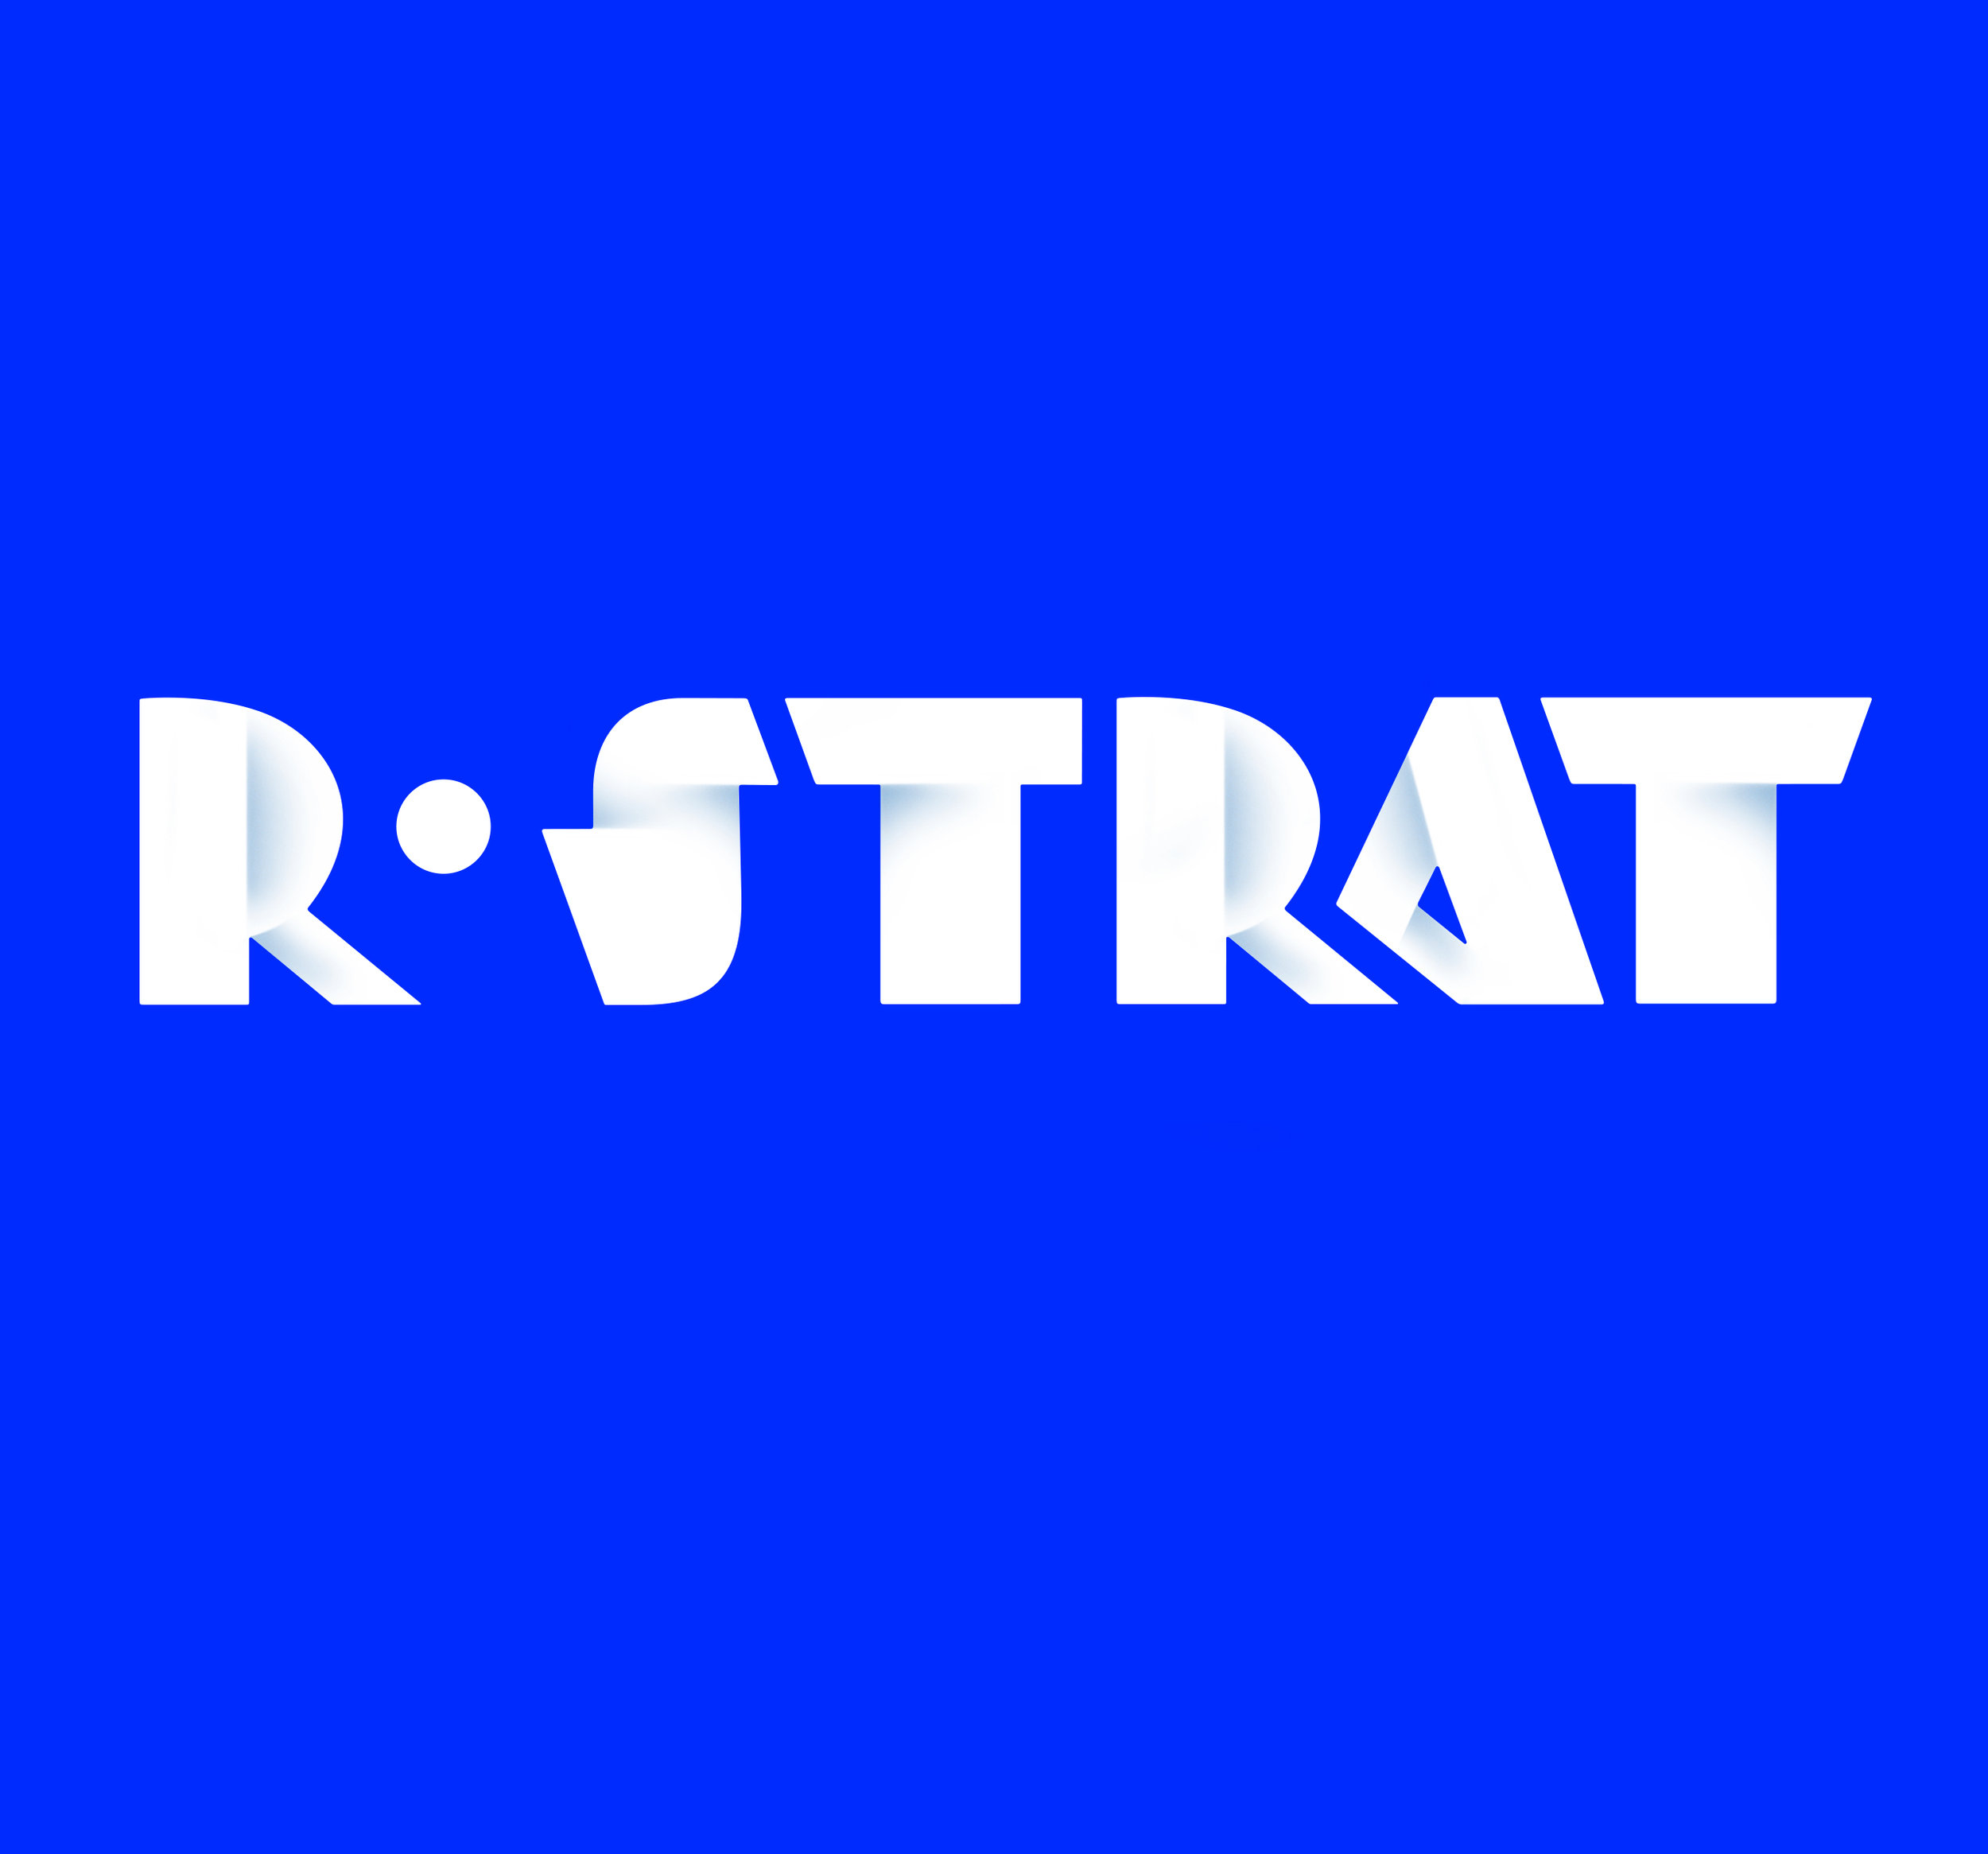 R-STRAT